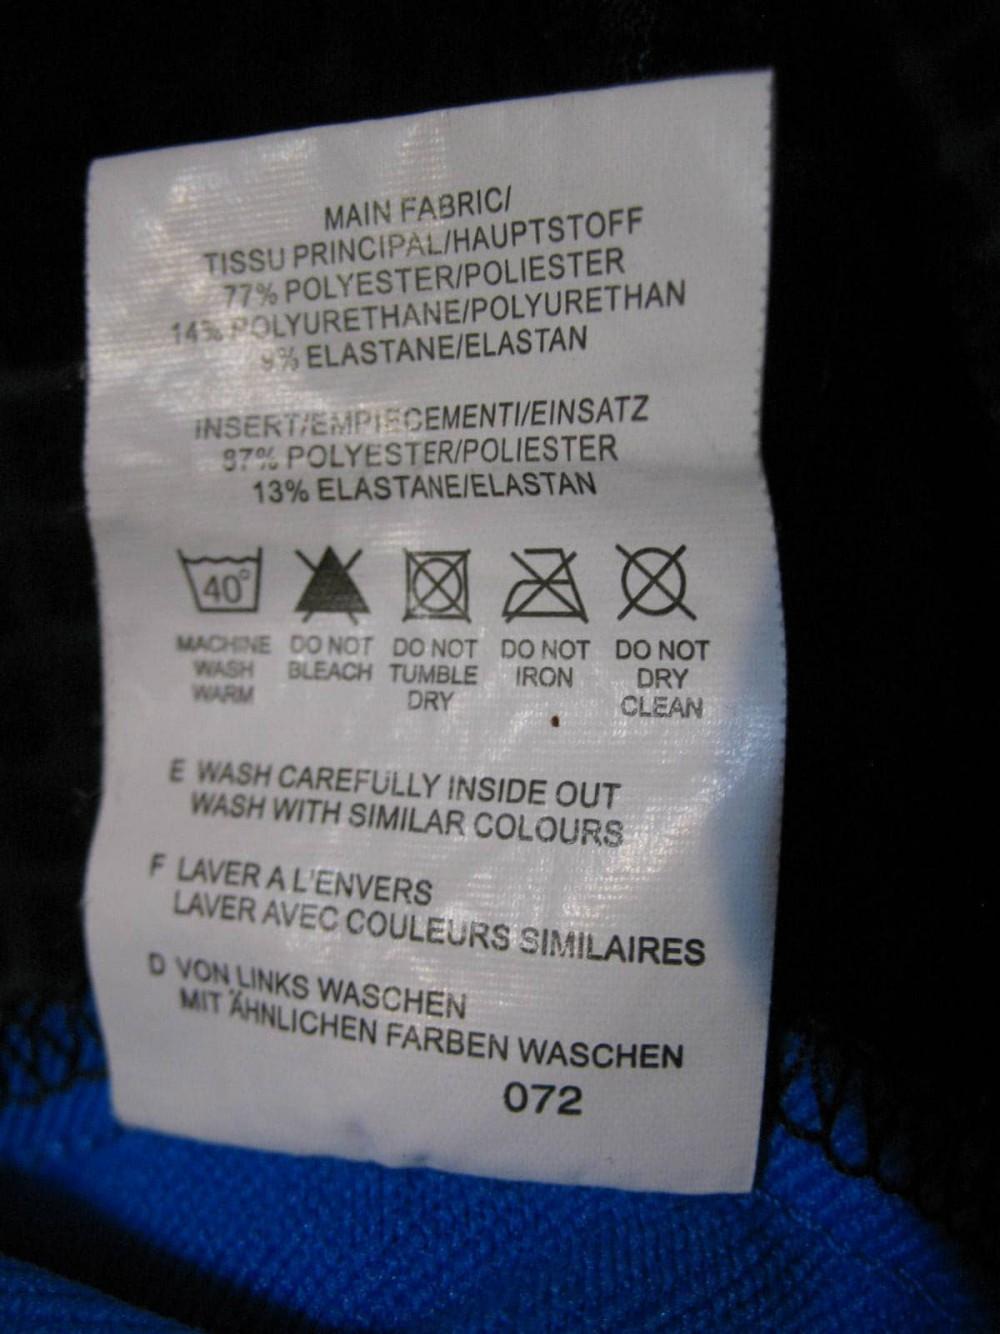 Куртка BJORN DAEHLIE by ODLO toko windproof jacket (размер L/XL) - 9